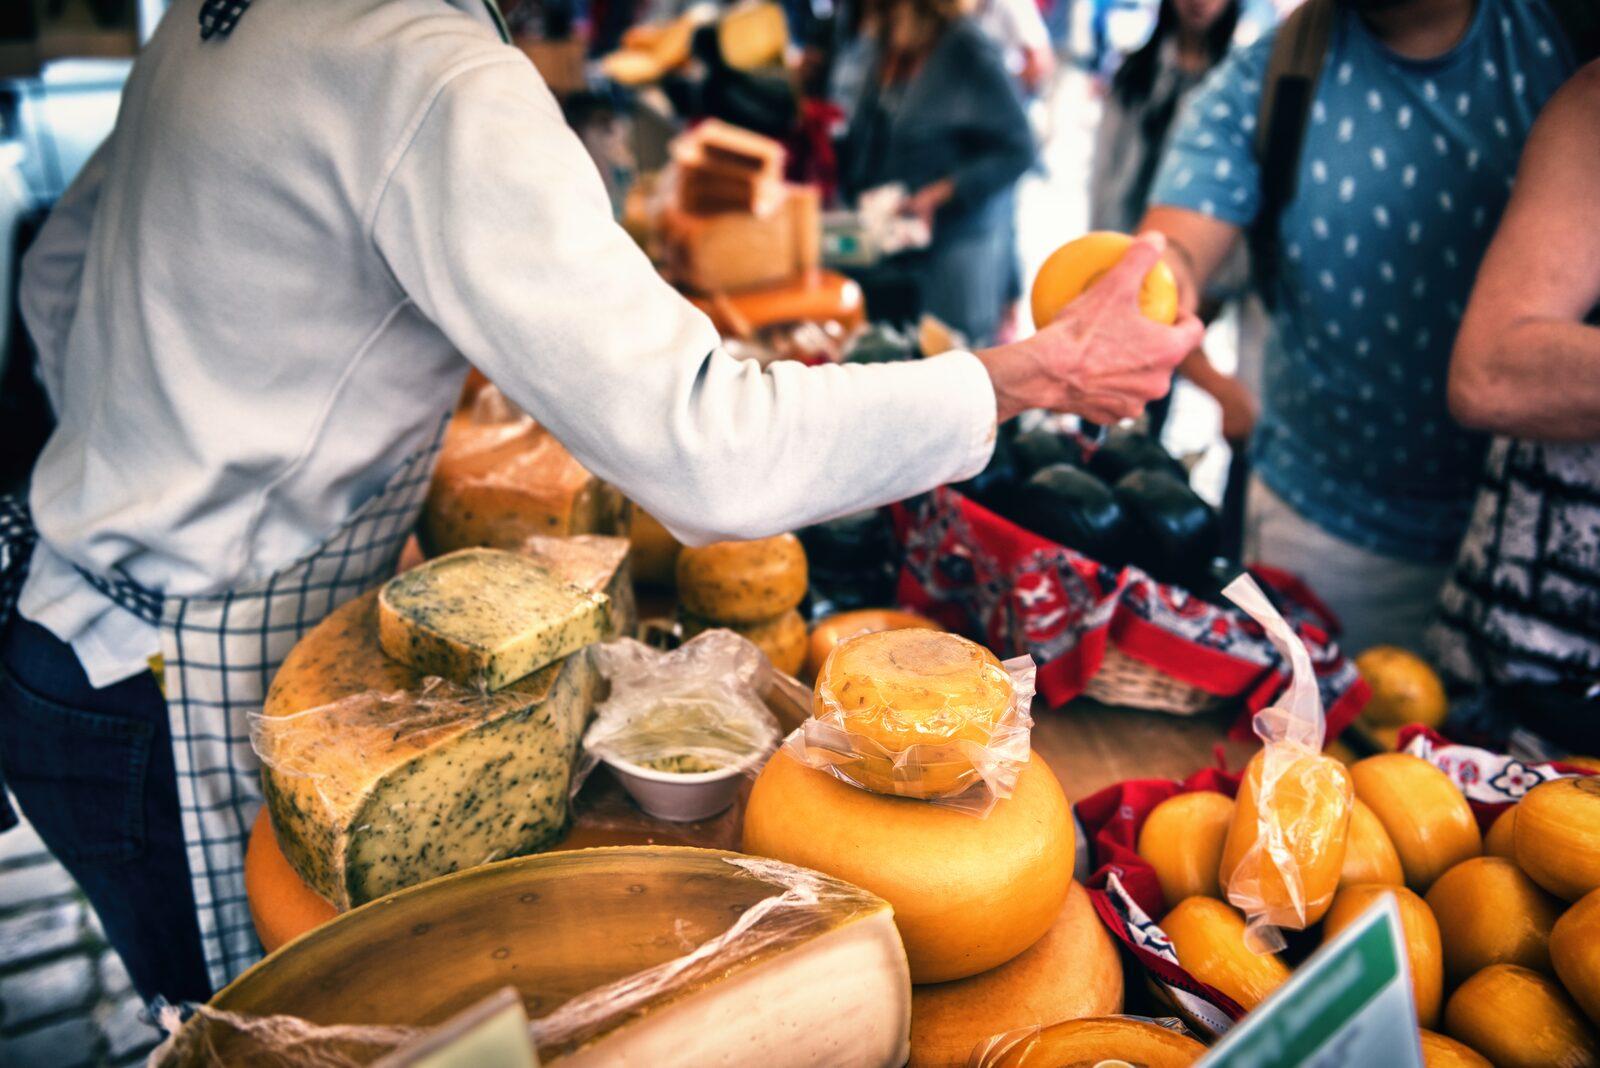 Veluwse avond markt